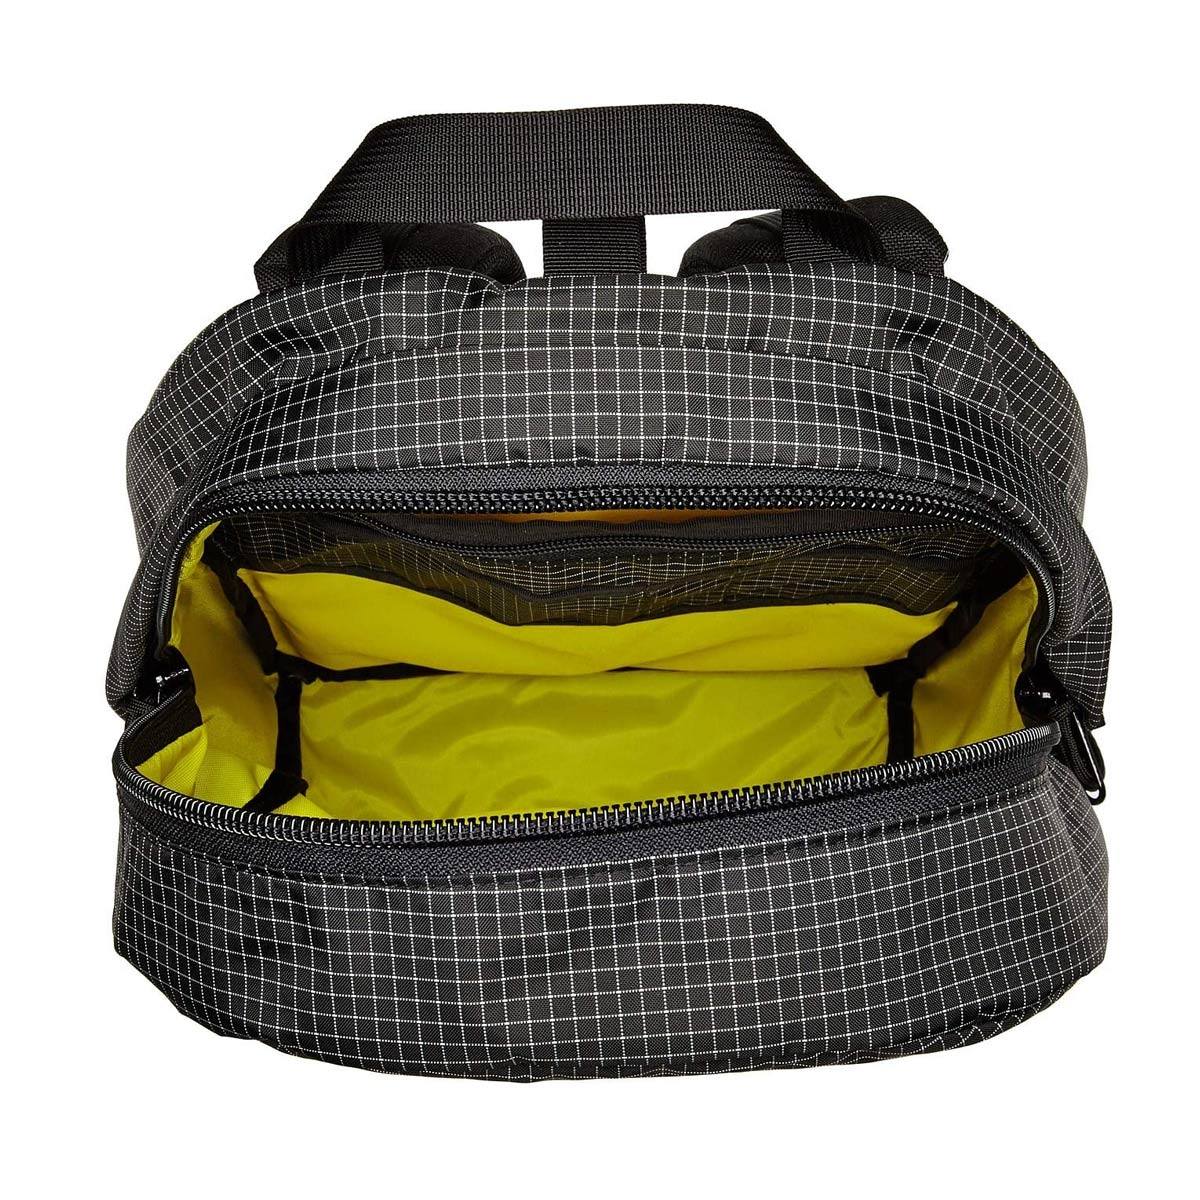 Topo Designs Daypack Black/White Ripstop, inside